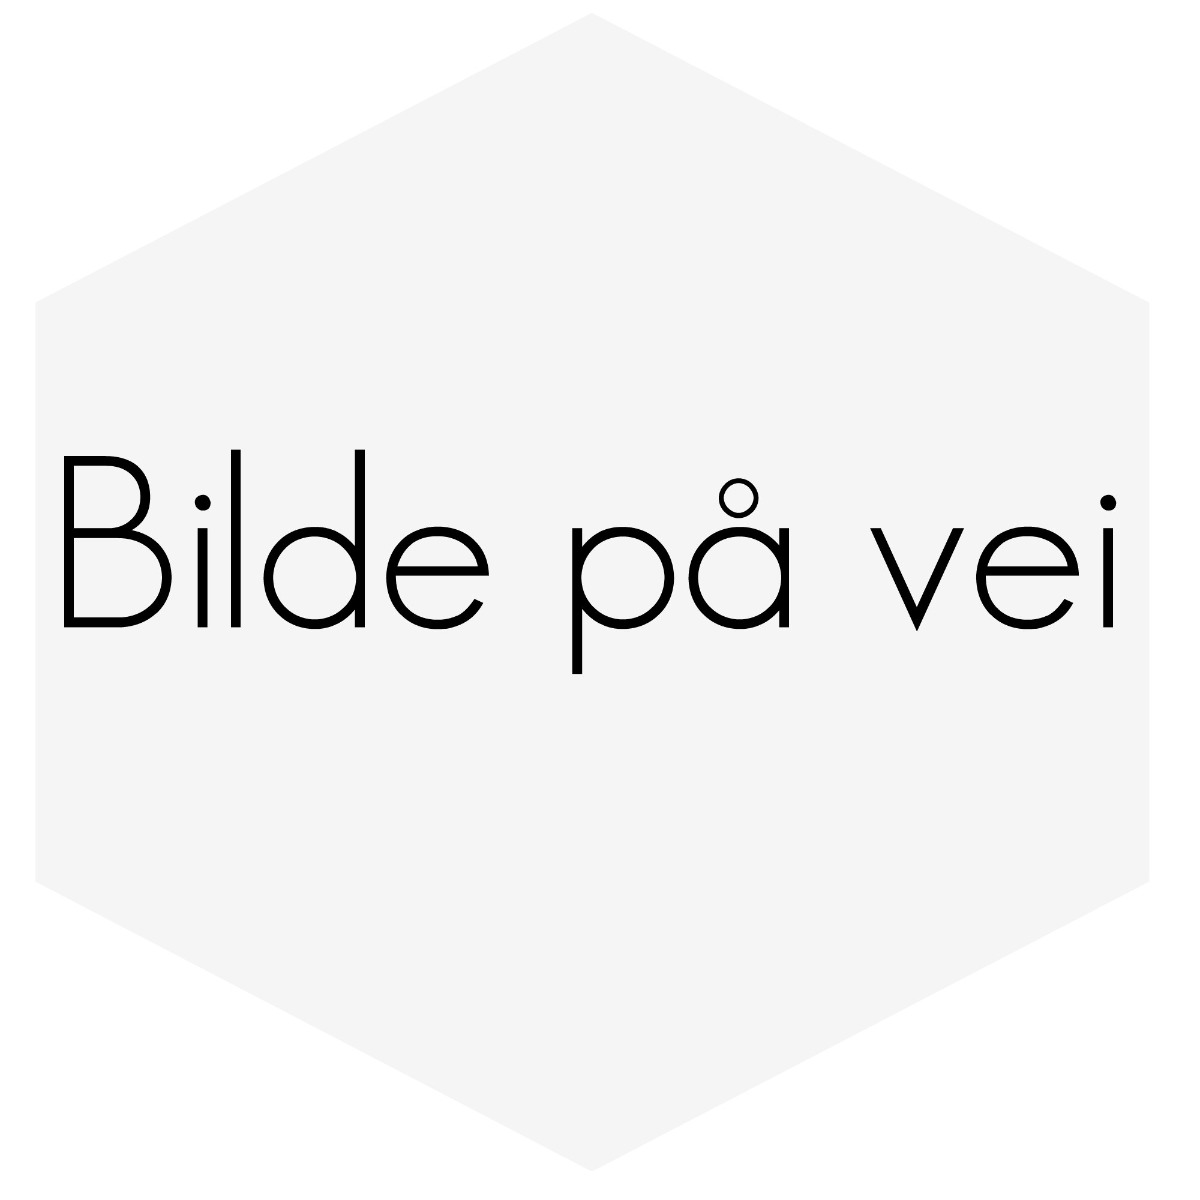 HOVEDLAMPE VOLVO S40/V50 04-07 EL.TYPE VENSTRE SIDE GRÅ